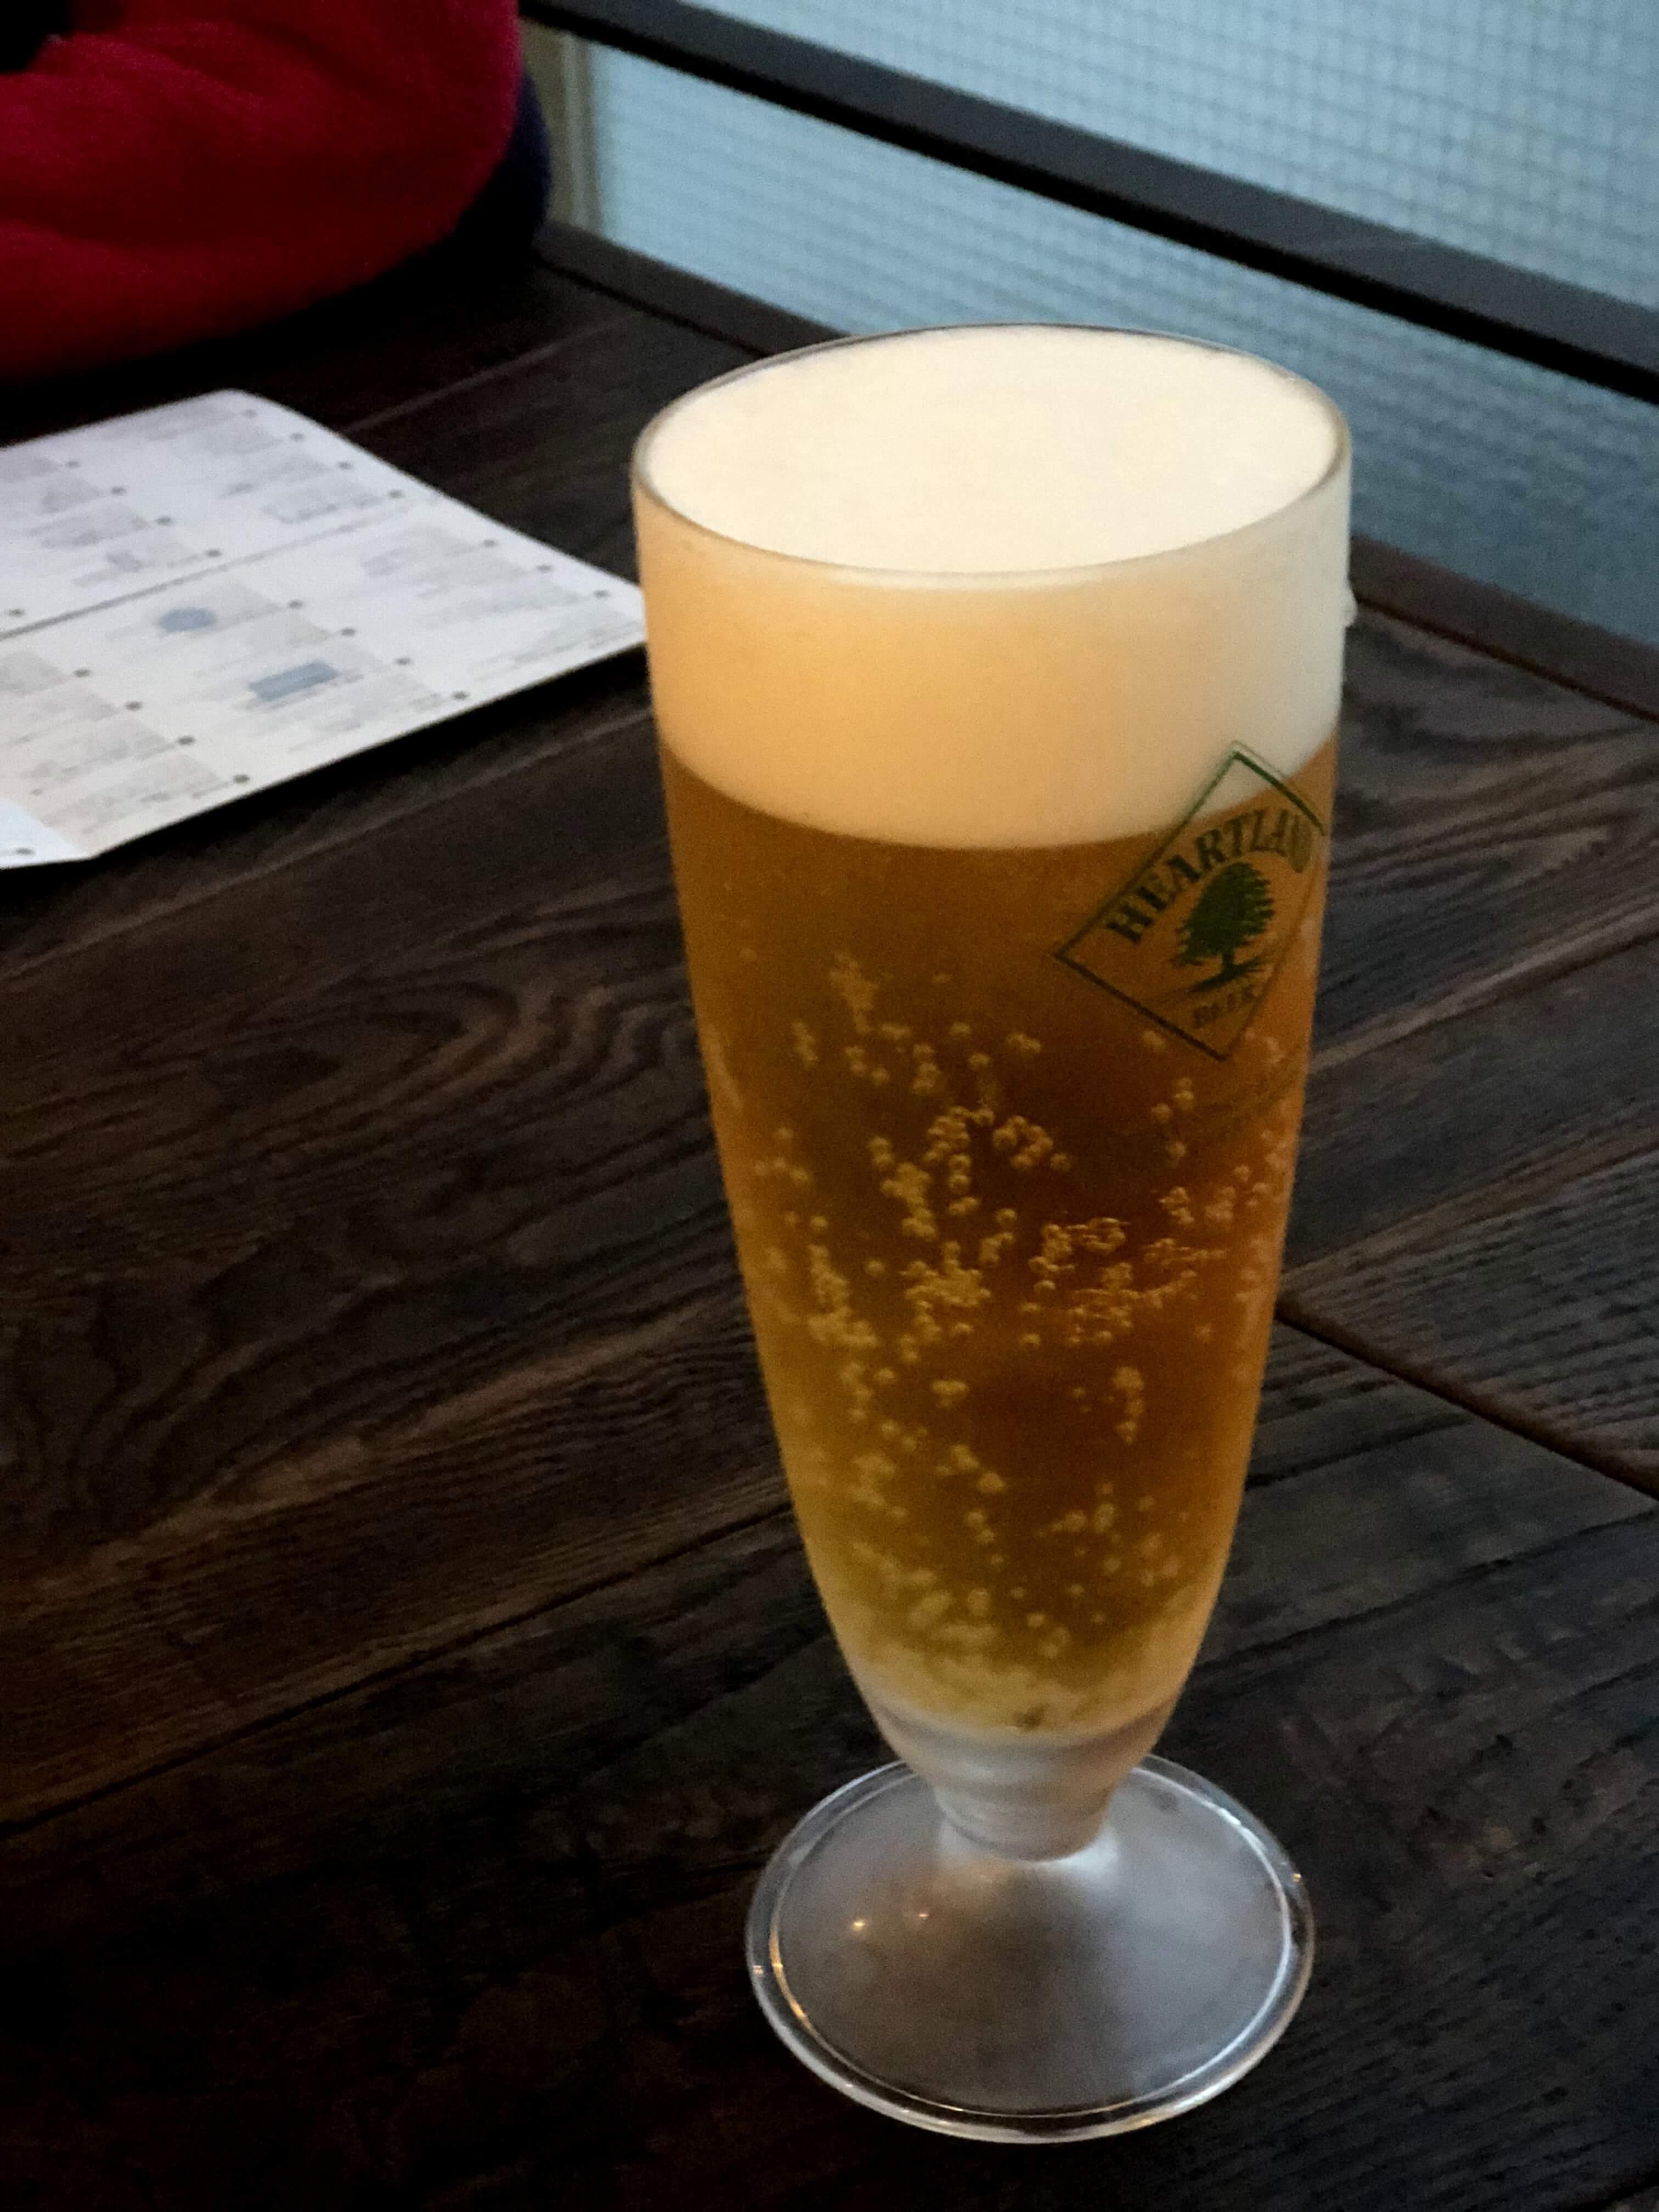 AWORKS(エーワークス)のビール